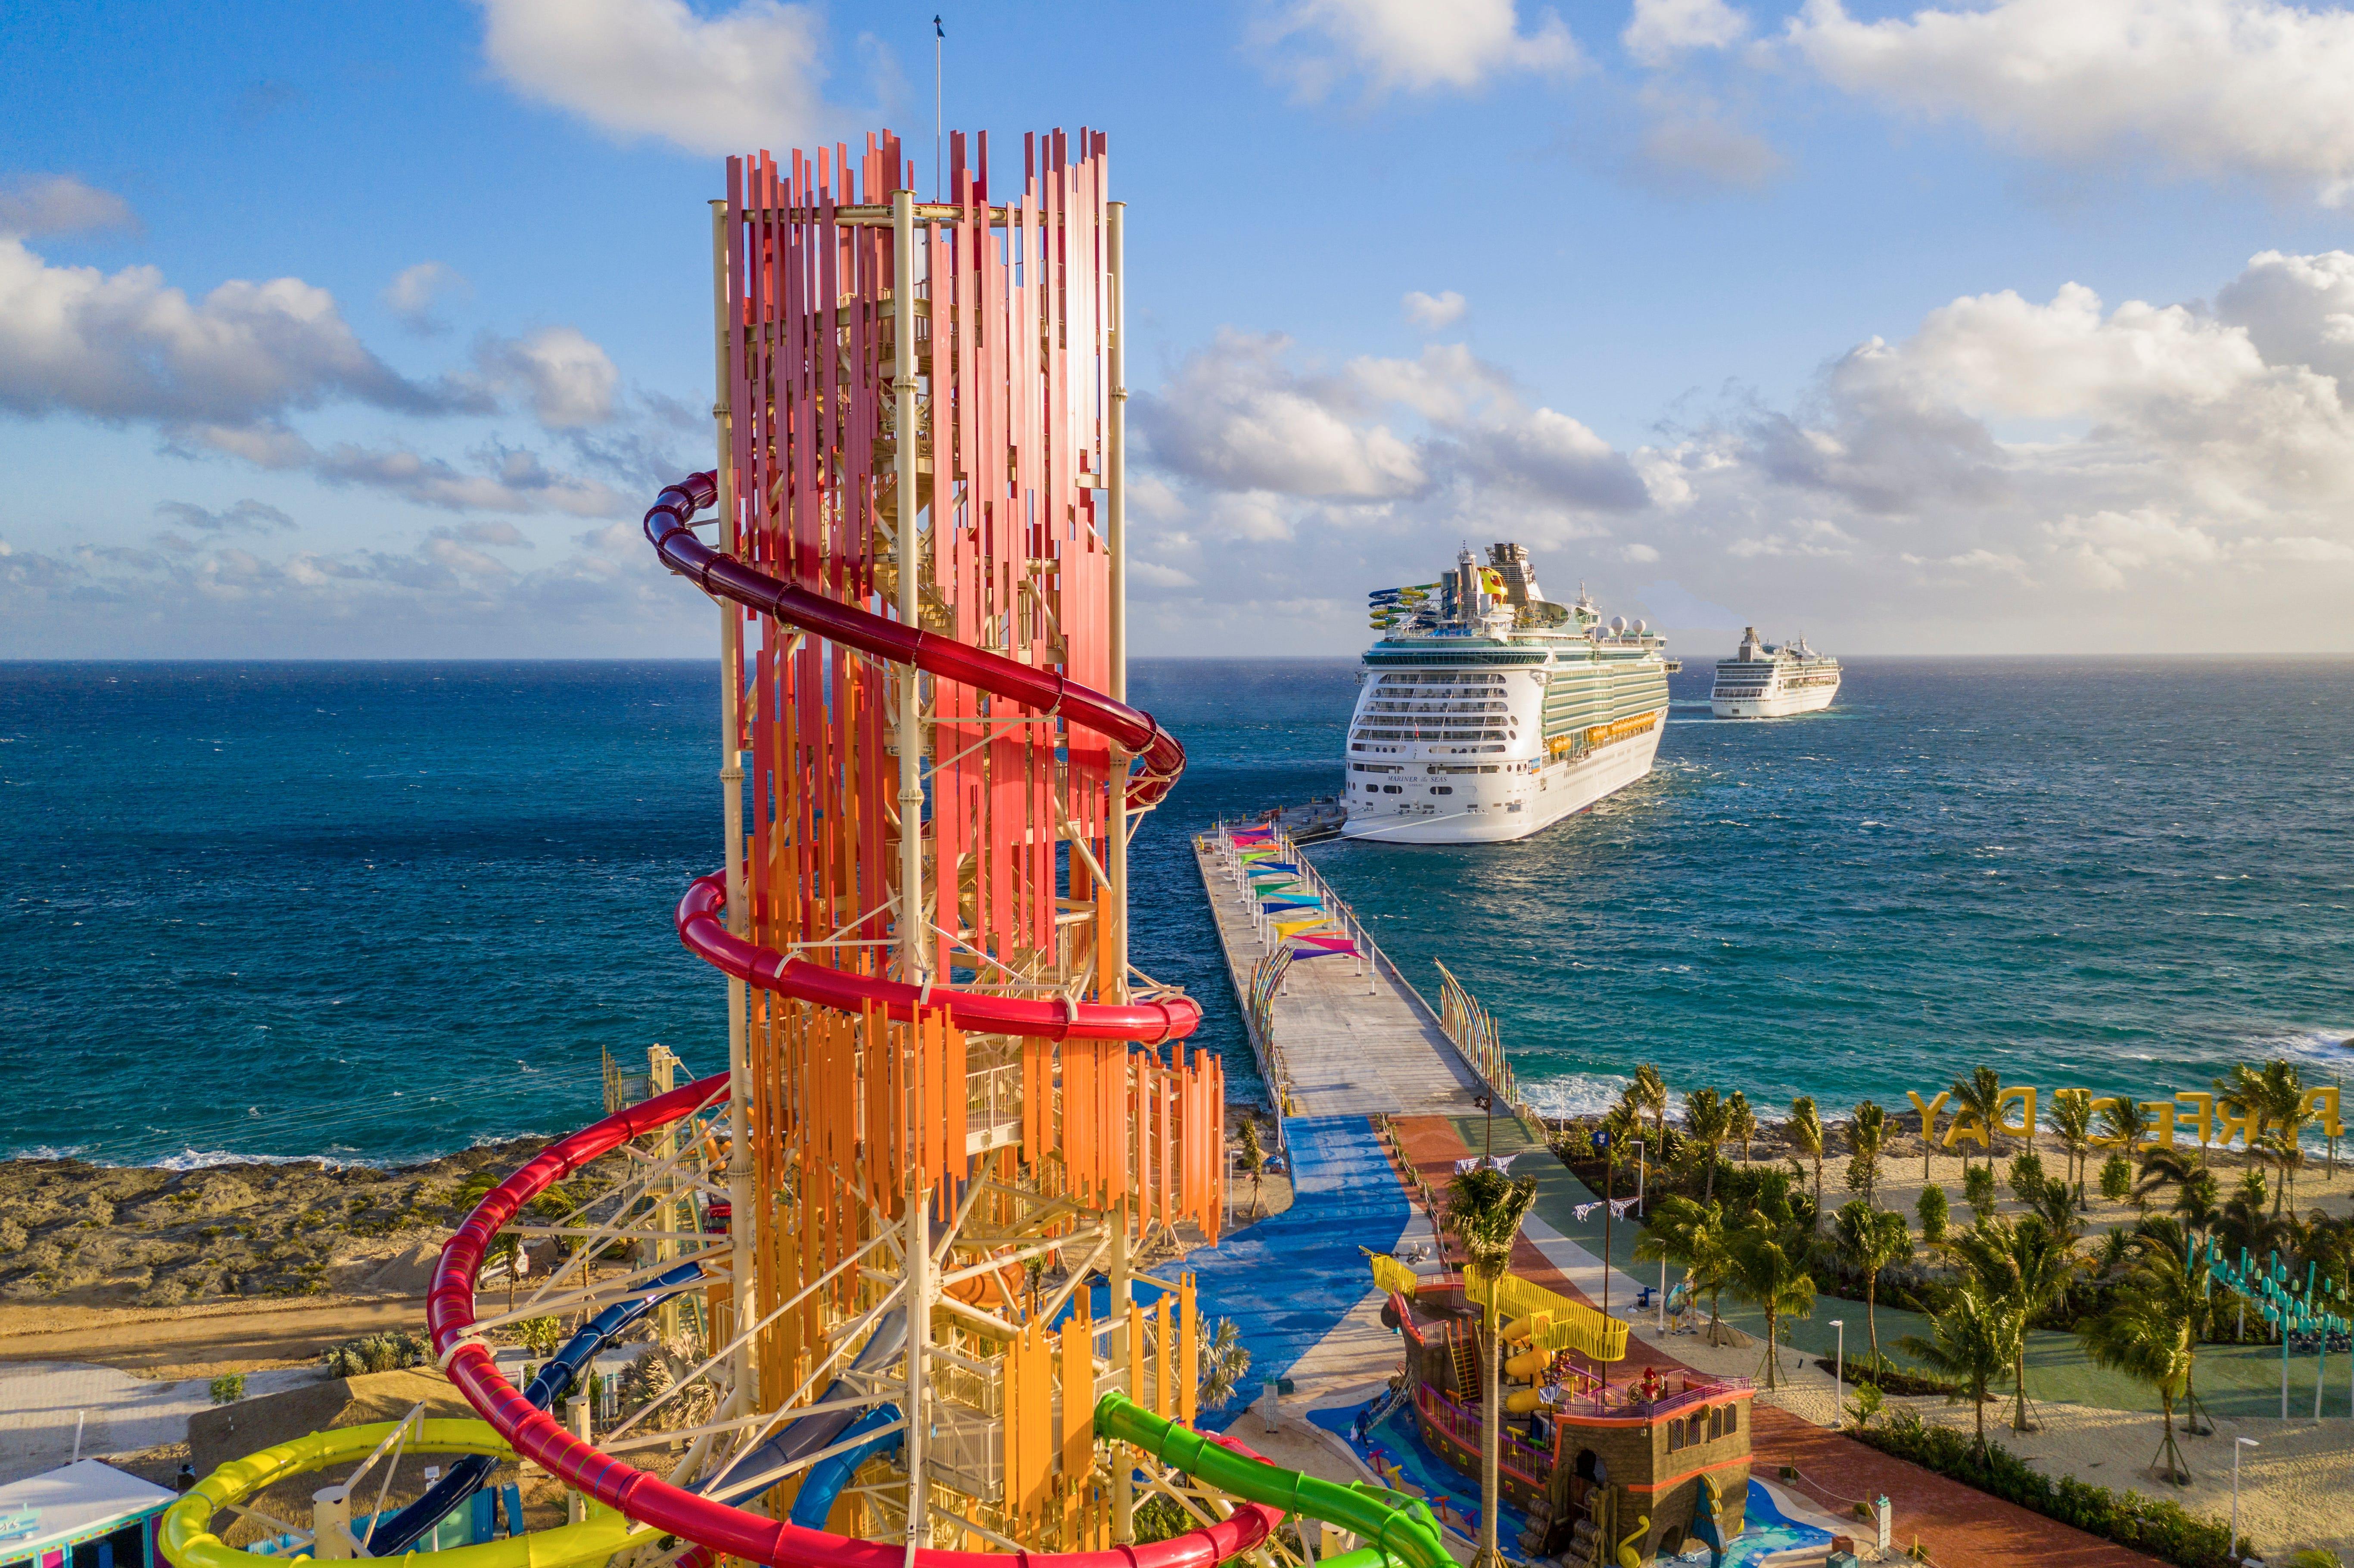 Royal Caribbean targets Vanuatu for first carbon-neutral private cruise destination